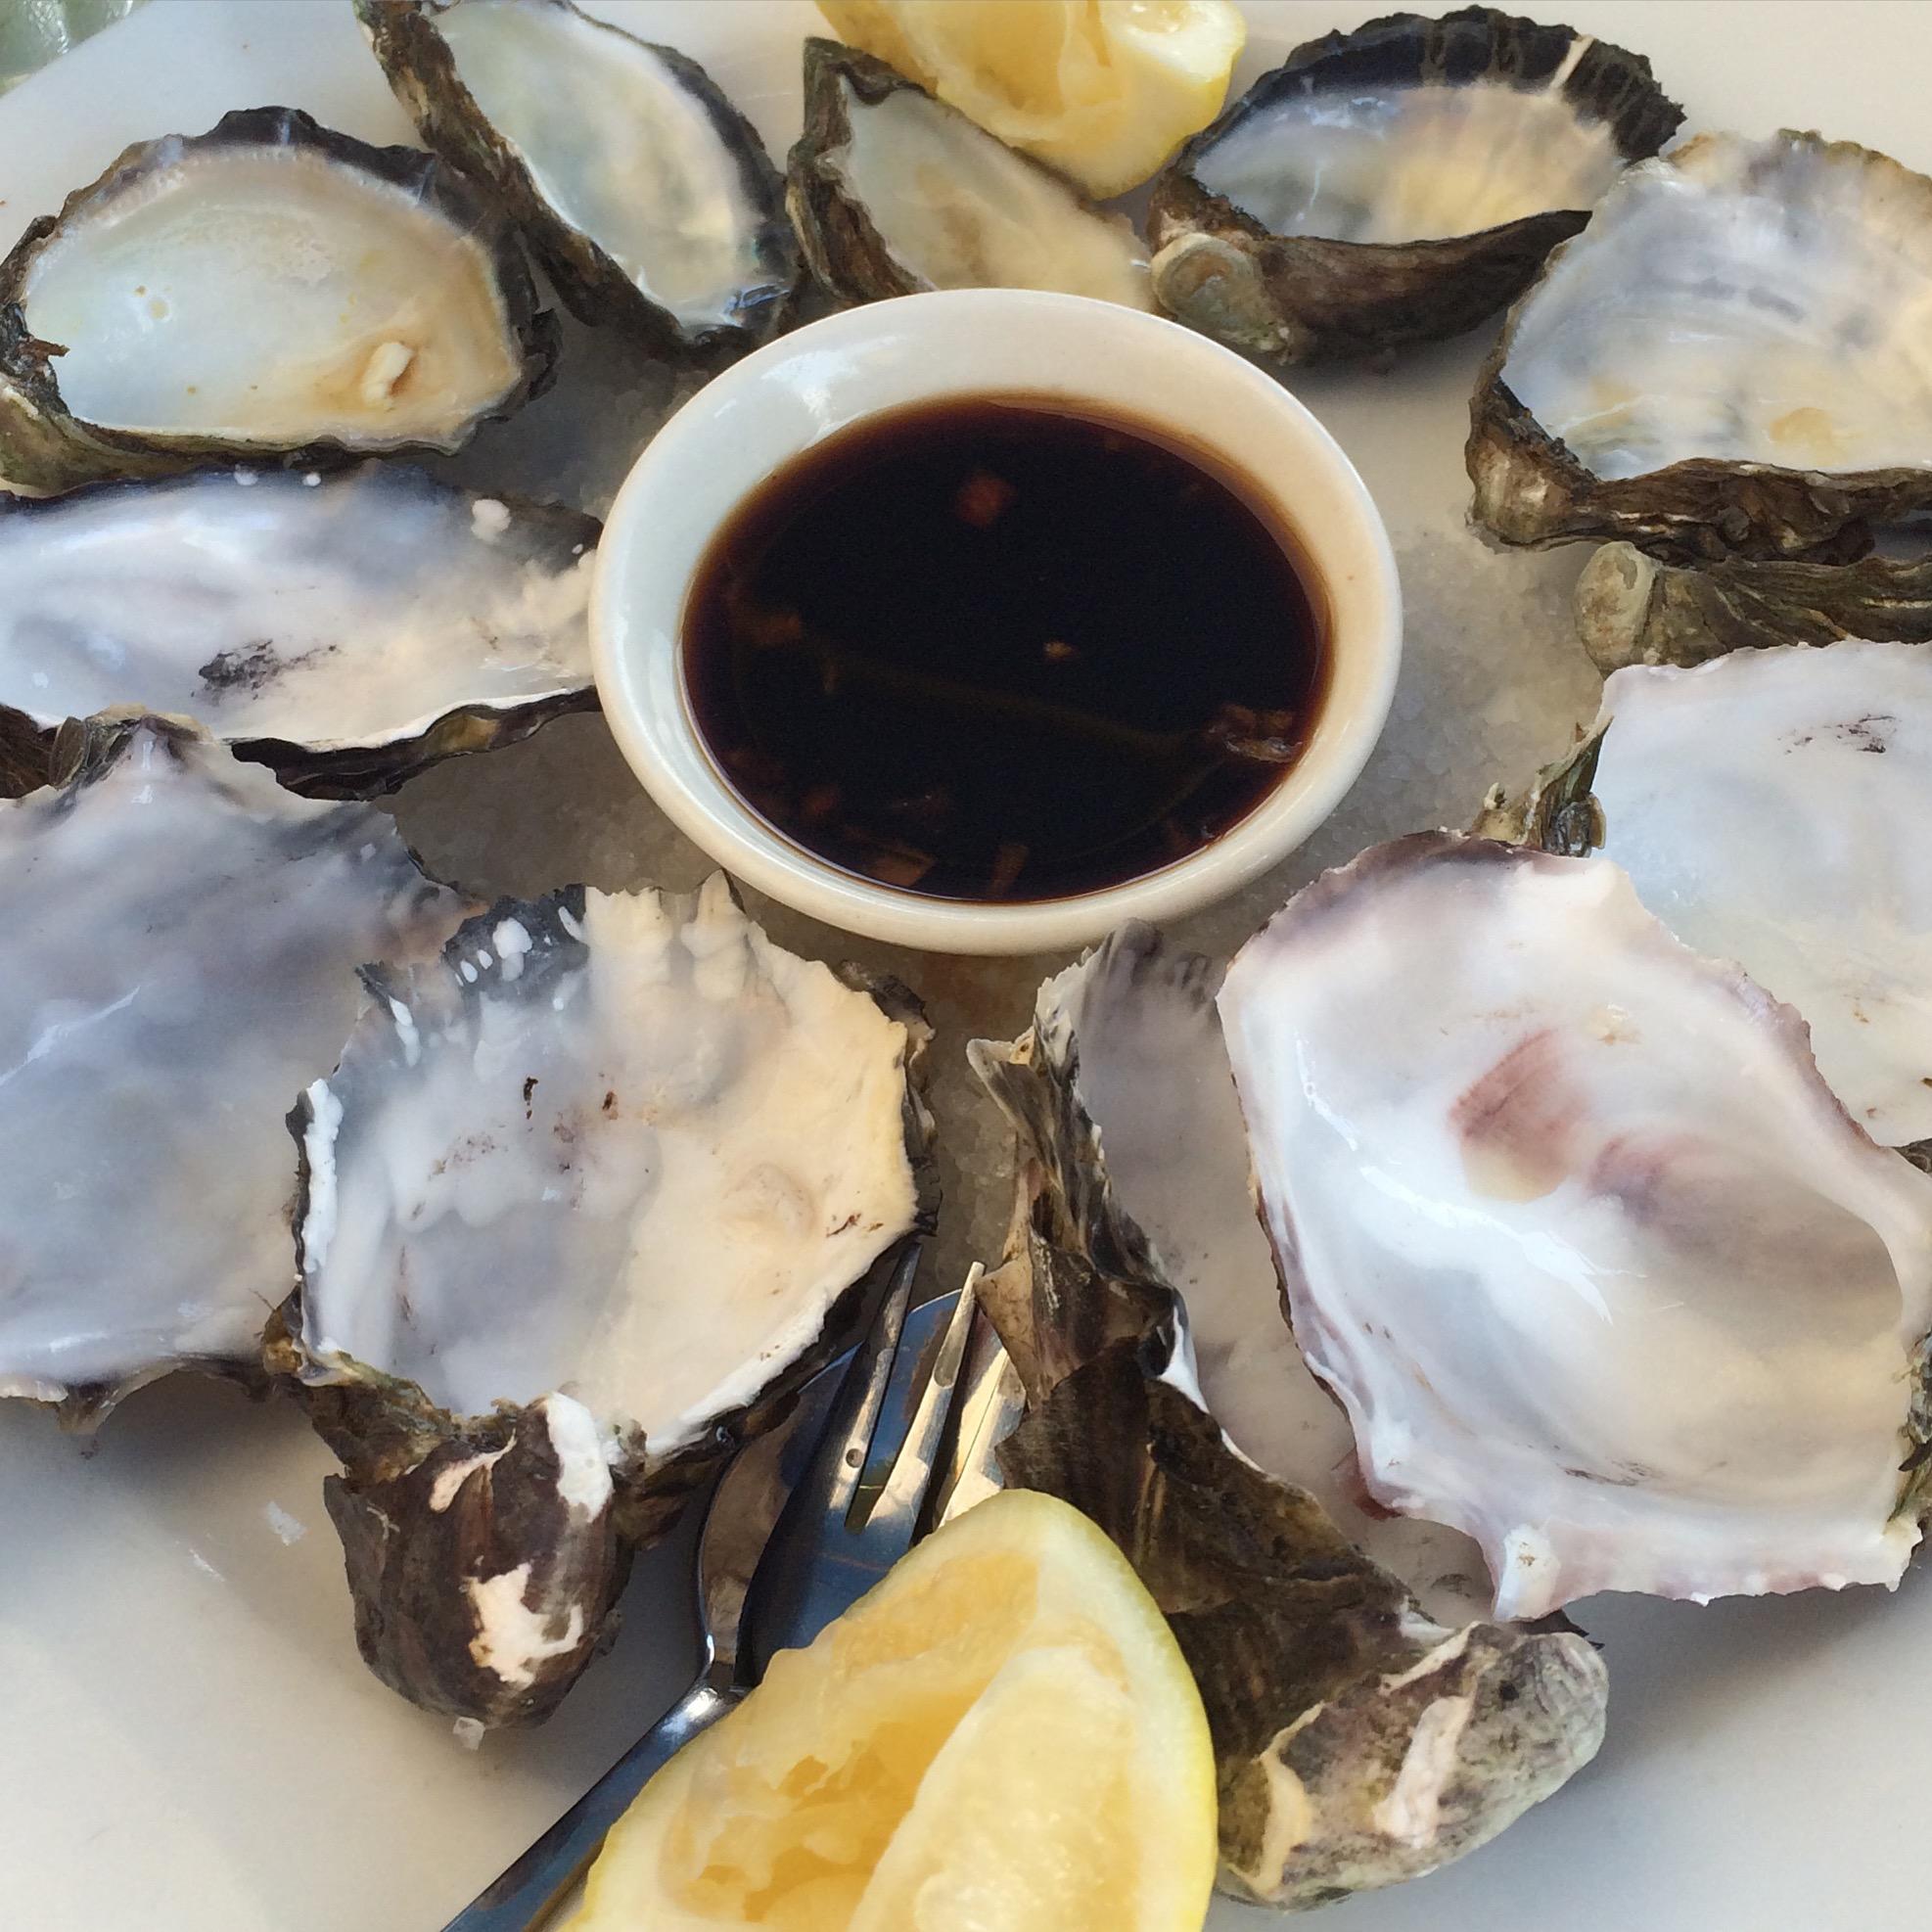 sweet suckering oysters